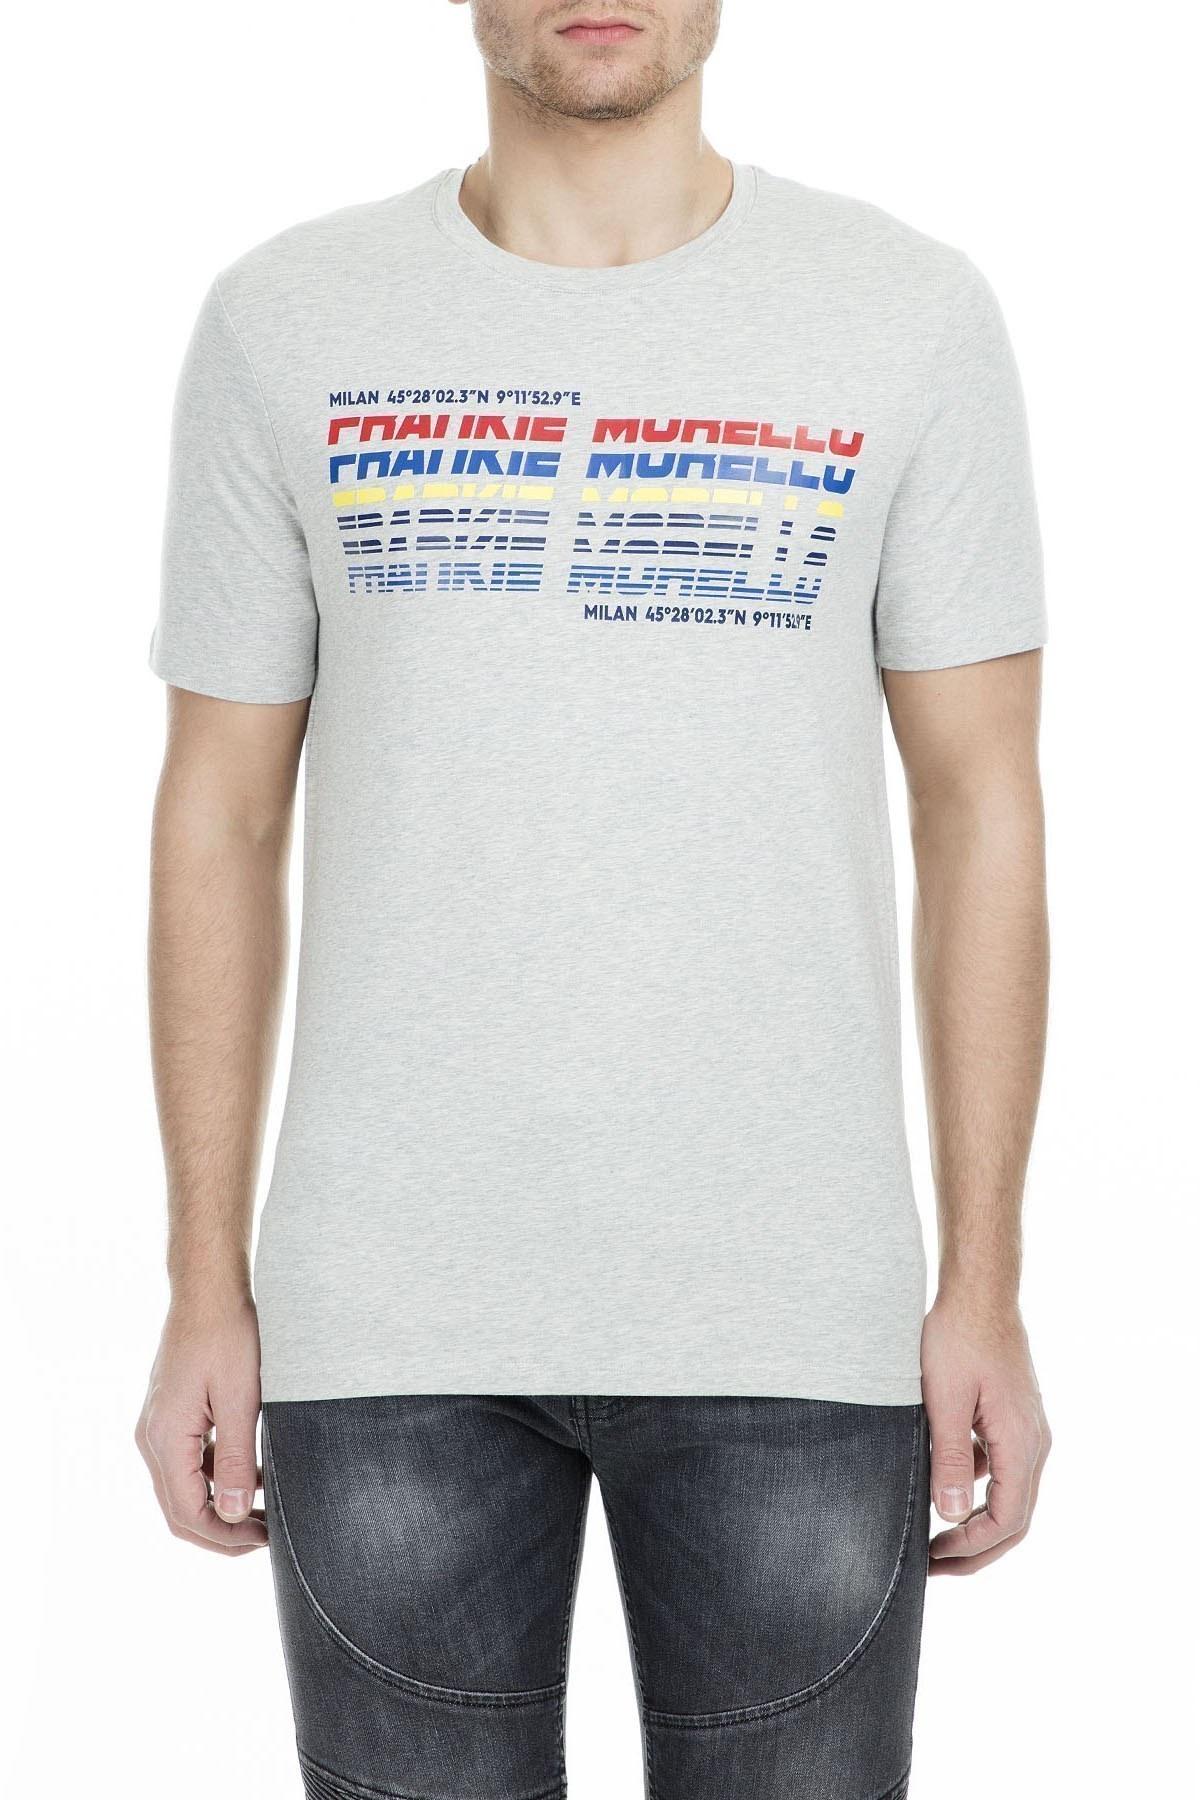 Frankie Morello Erkek T Shirt FMCS9052TS G05 GRİ